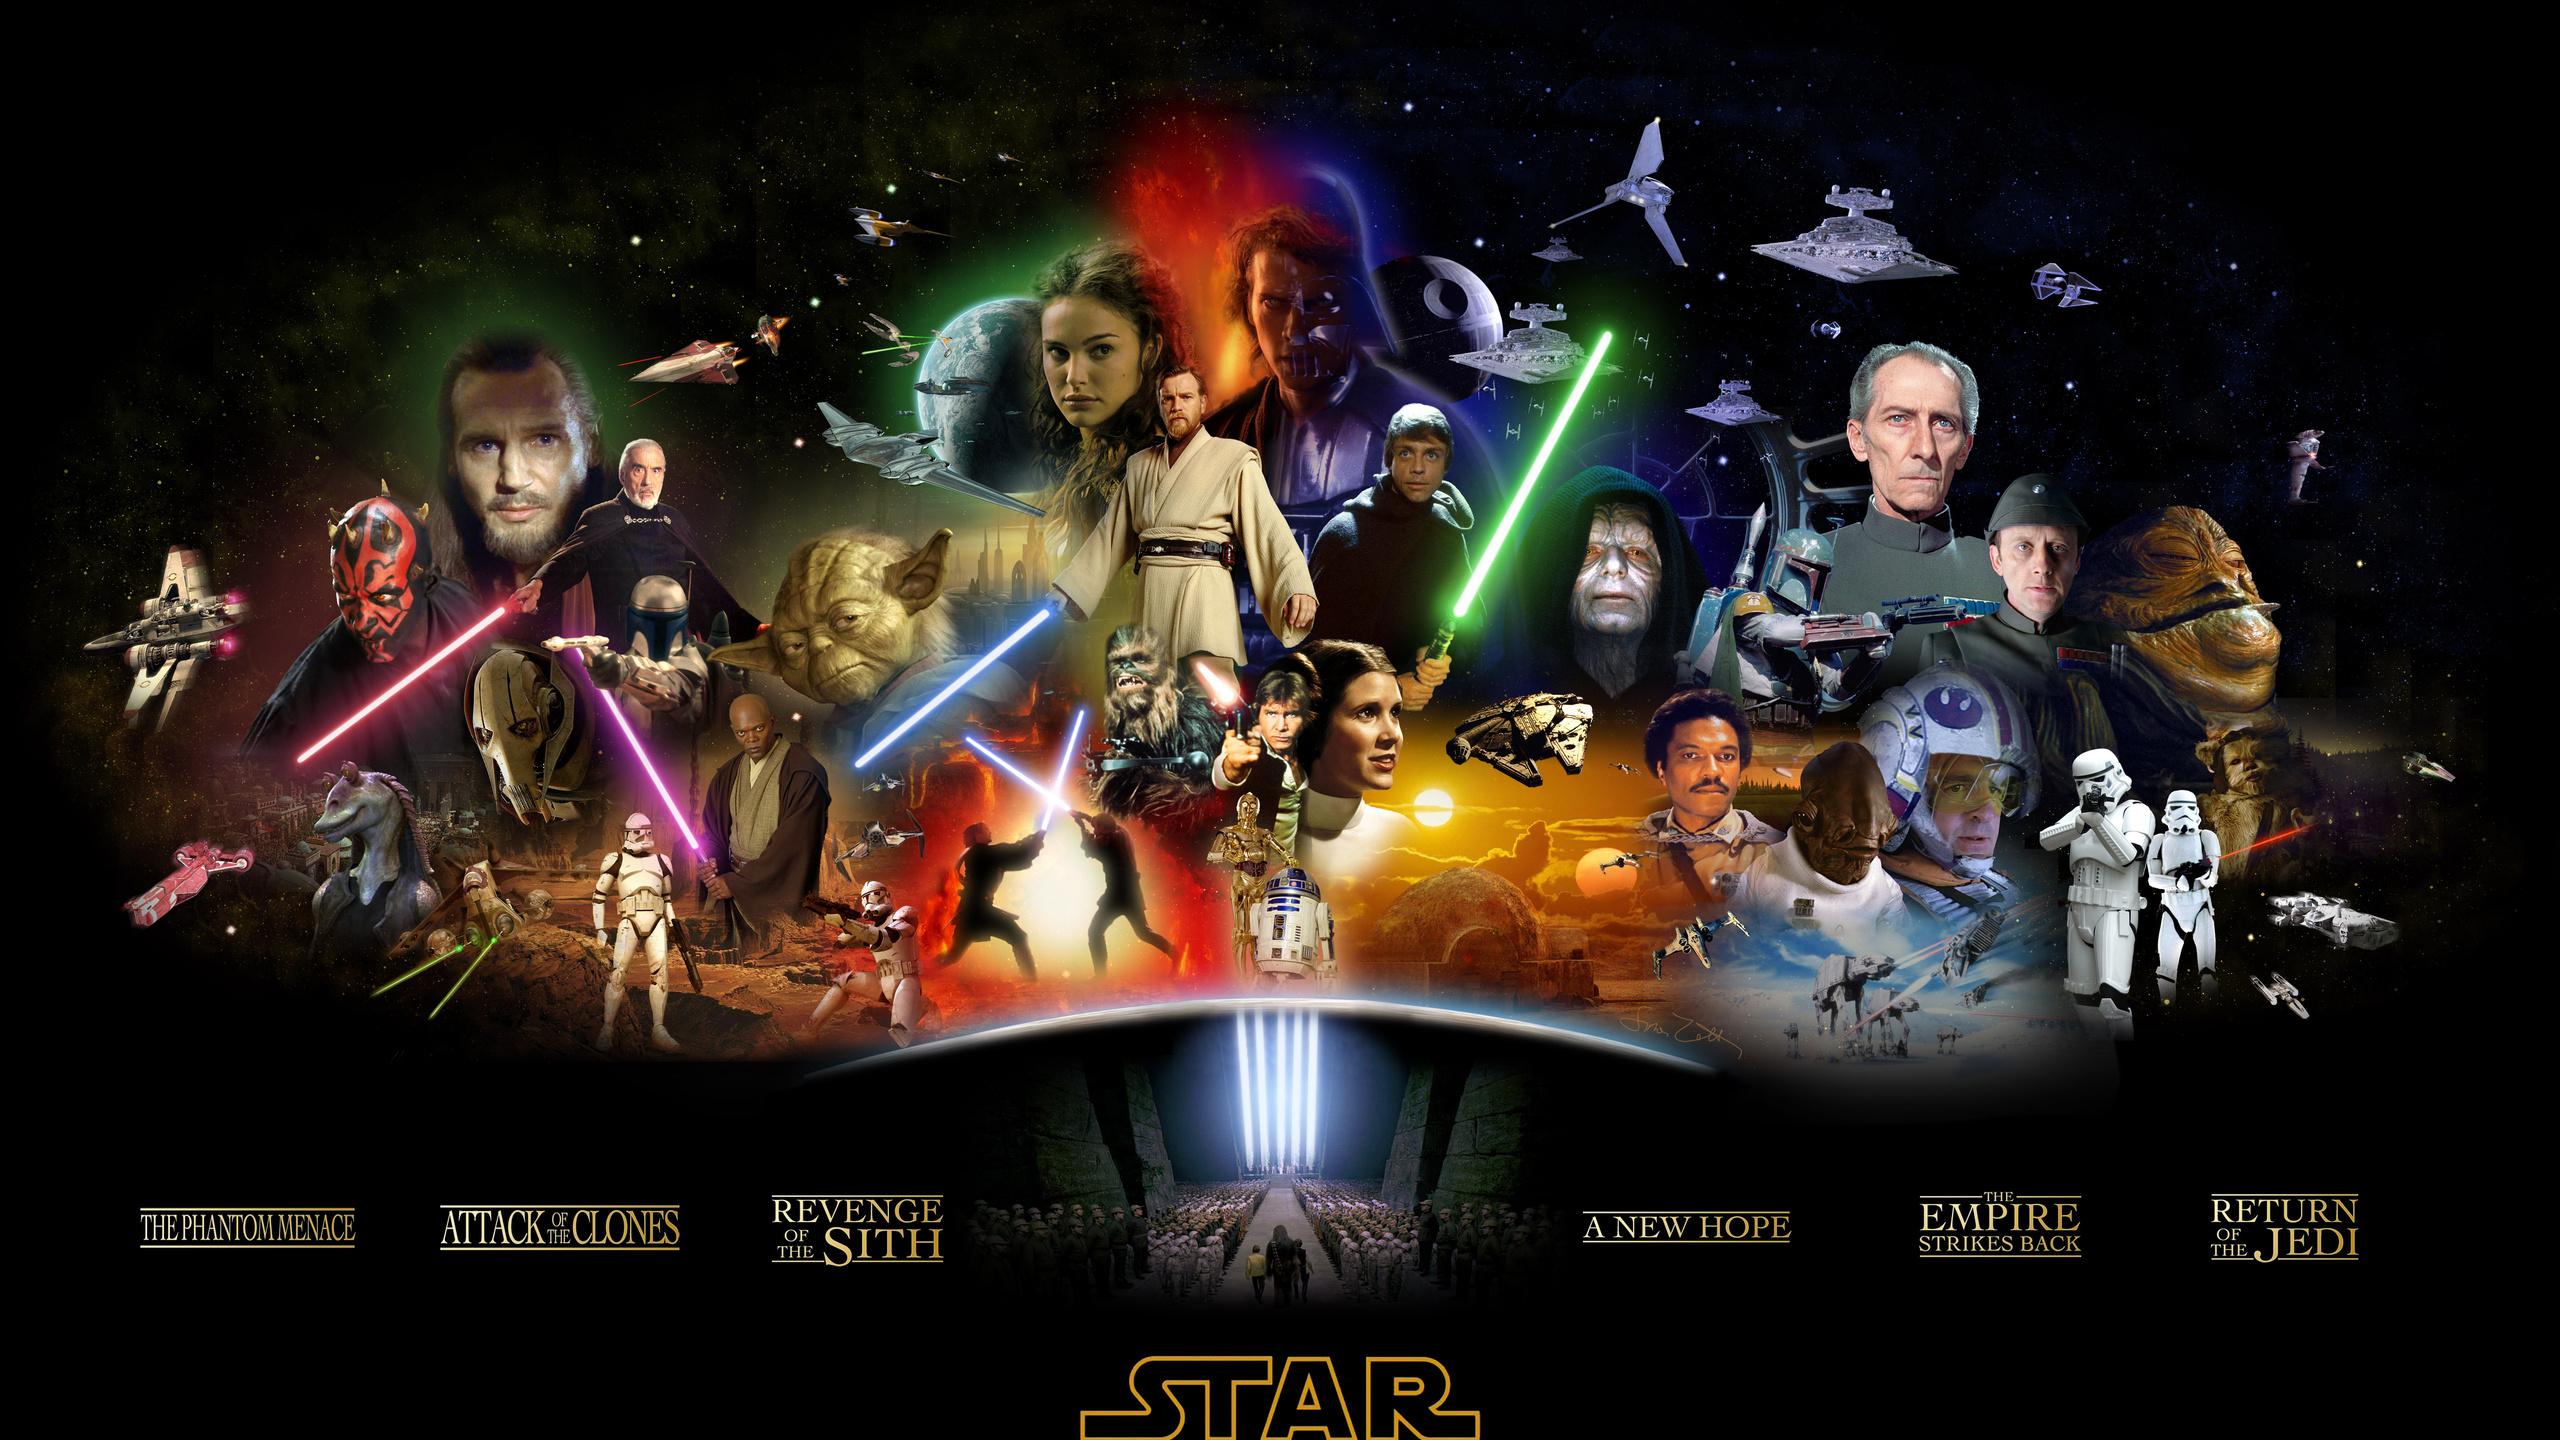 Star wars, звёздные войны, сага, герои, актеры, черный фон, коллаж